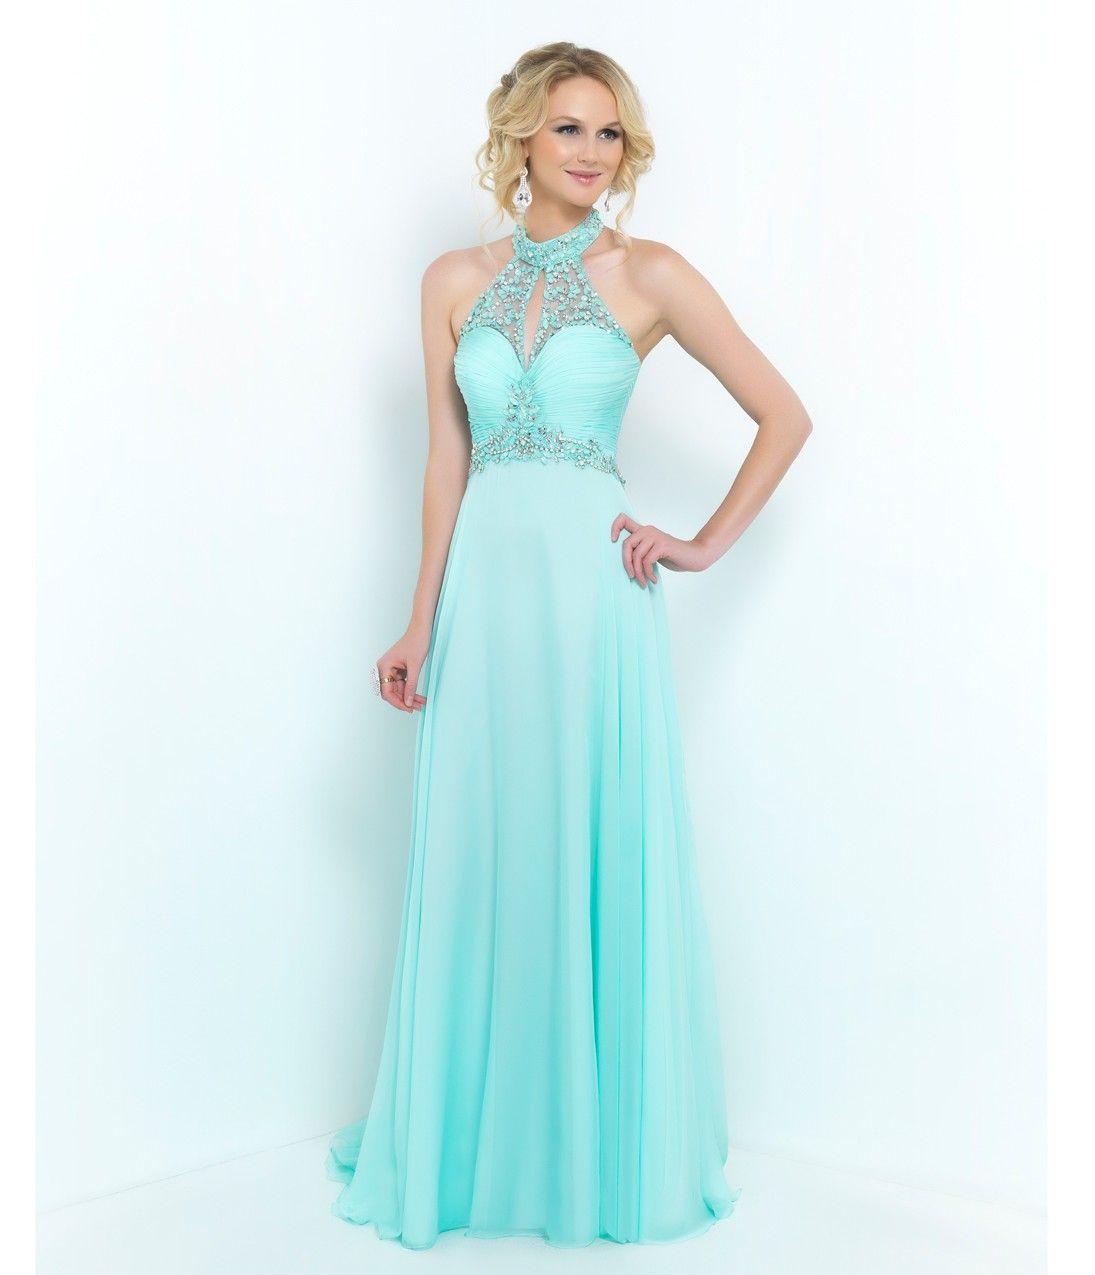 Blush Prom Aquamarine Beaded Halter Chiffon #Prom Dress ...